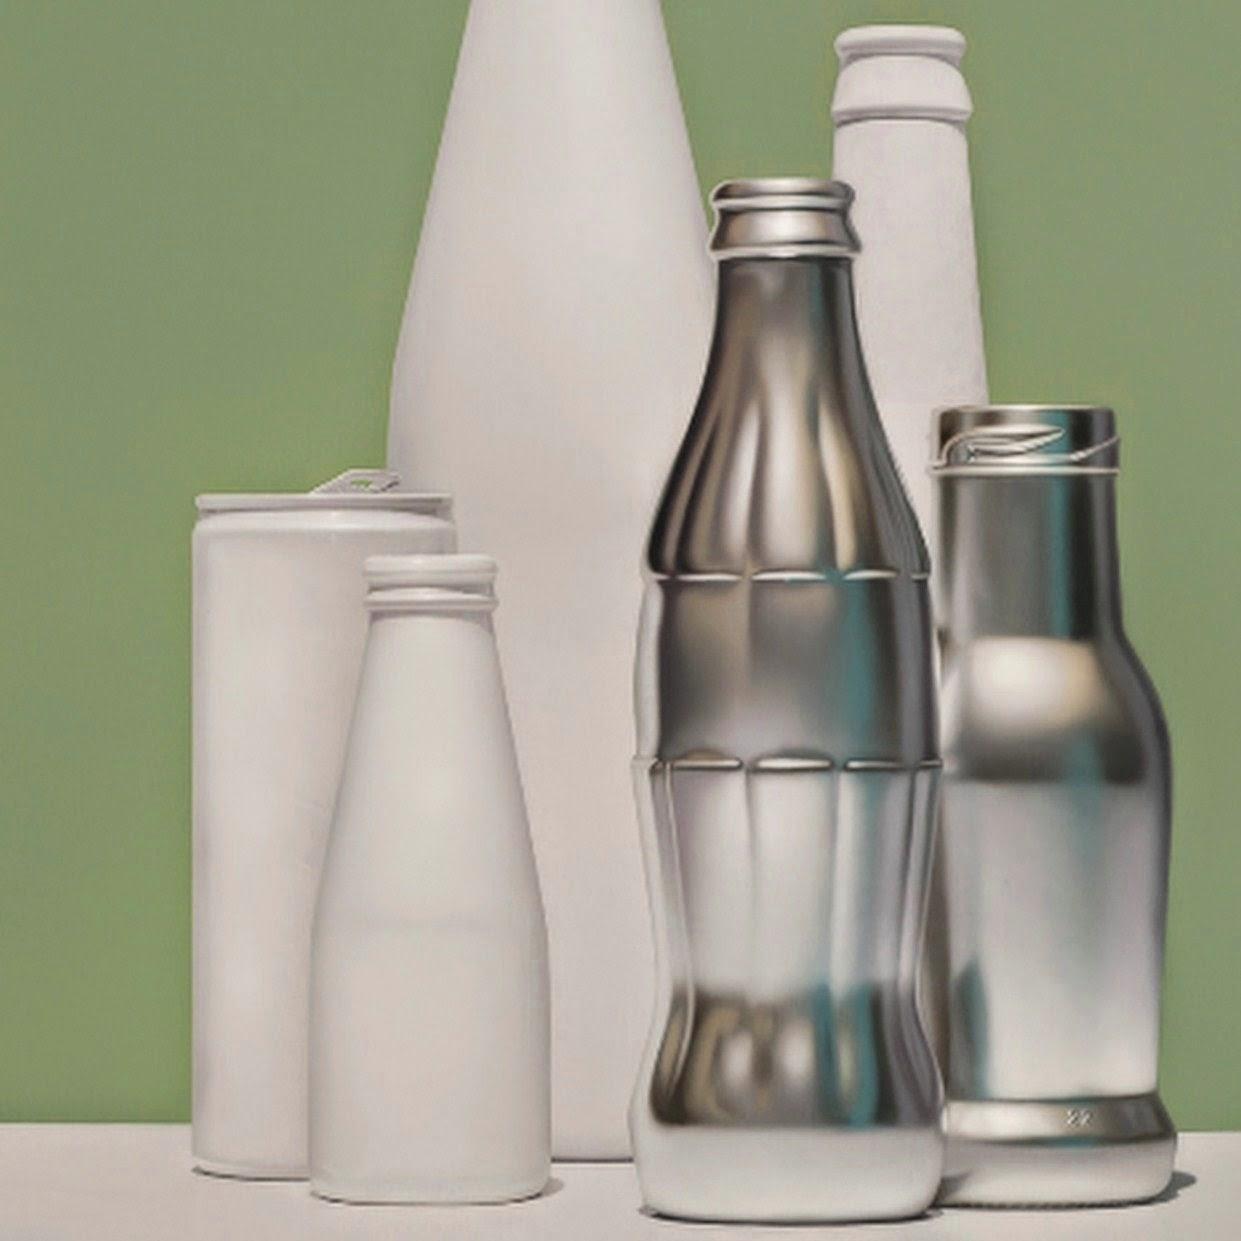 bodegones-decorativos-modernos-al-oleo